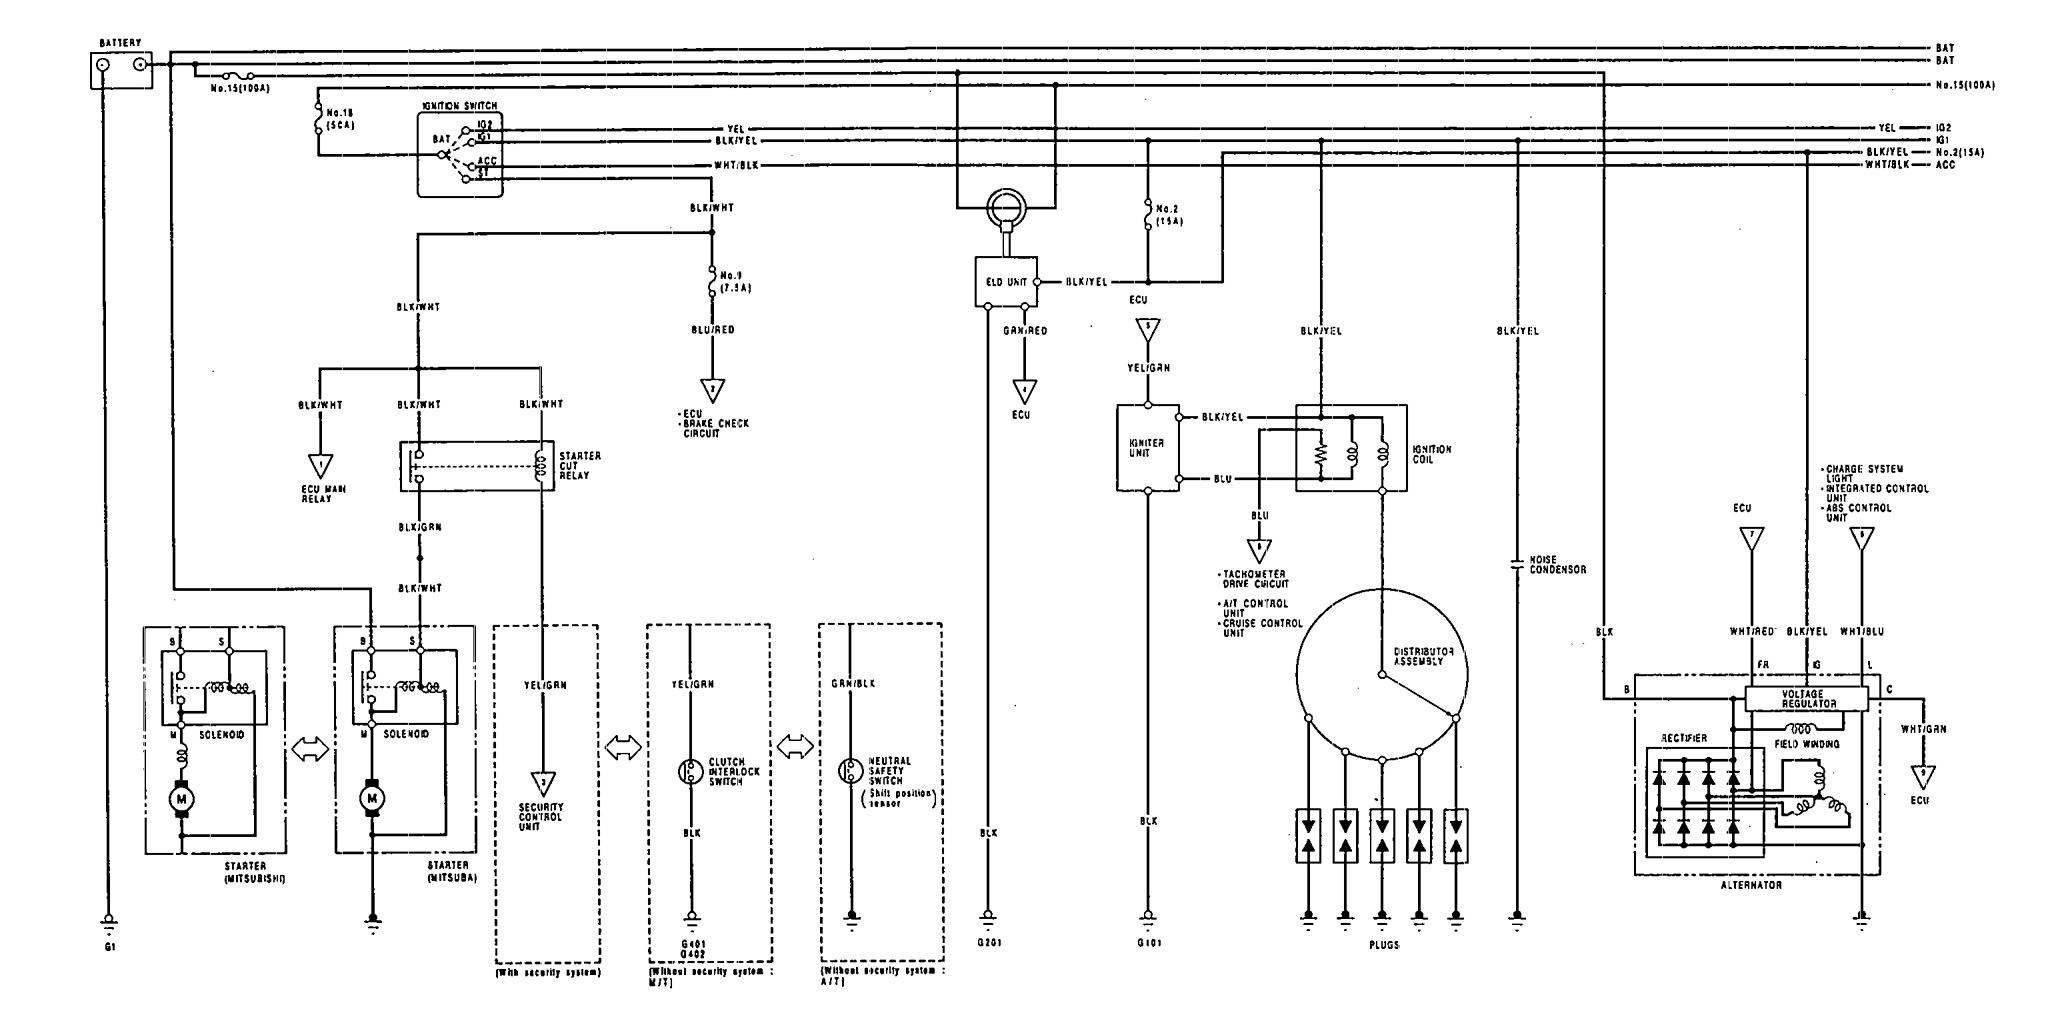 acura vigor  1992  - wiring diagrams - starting